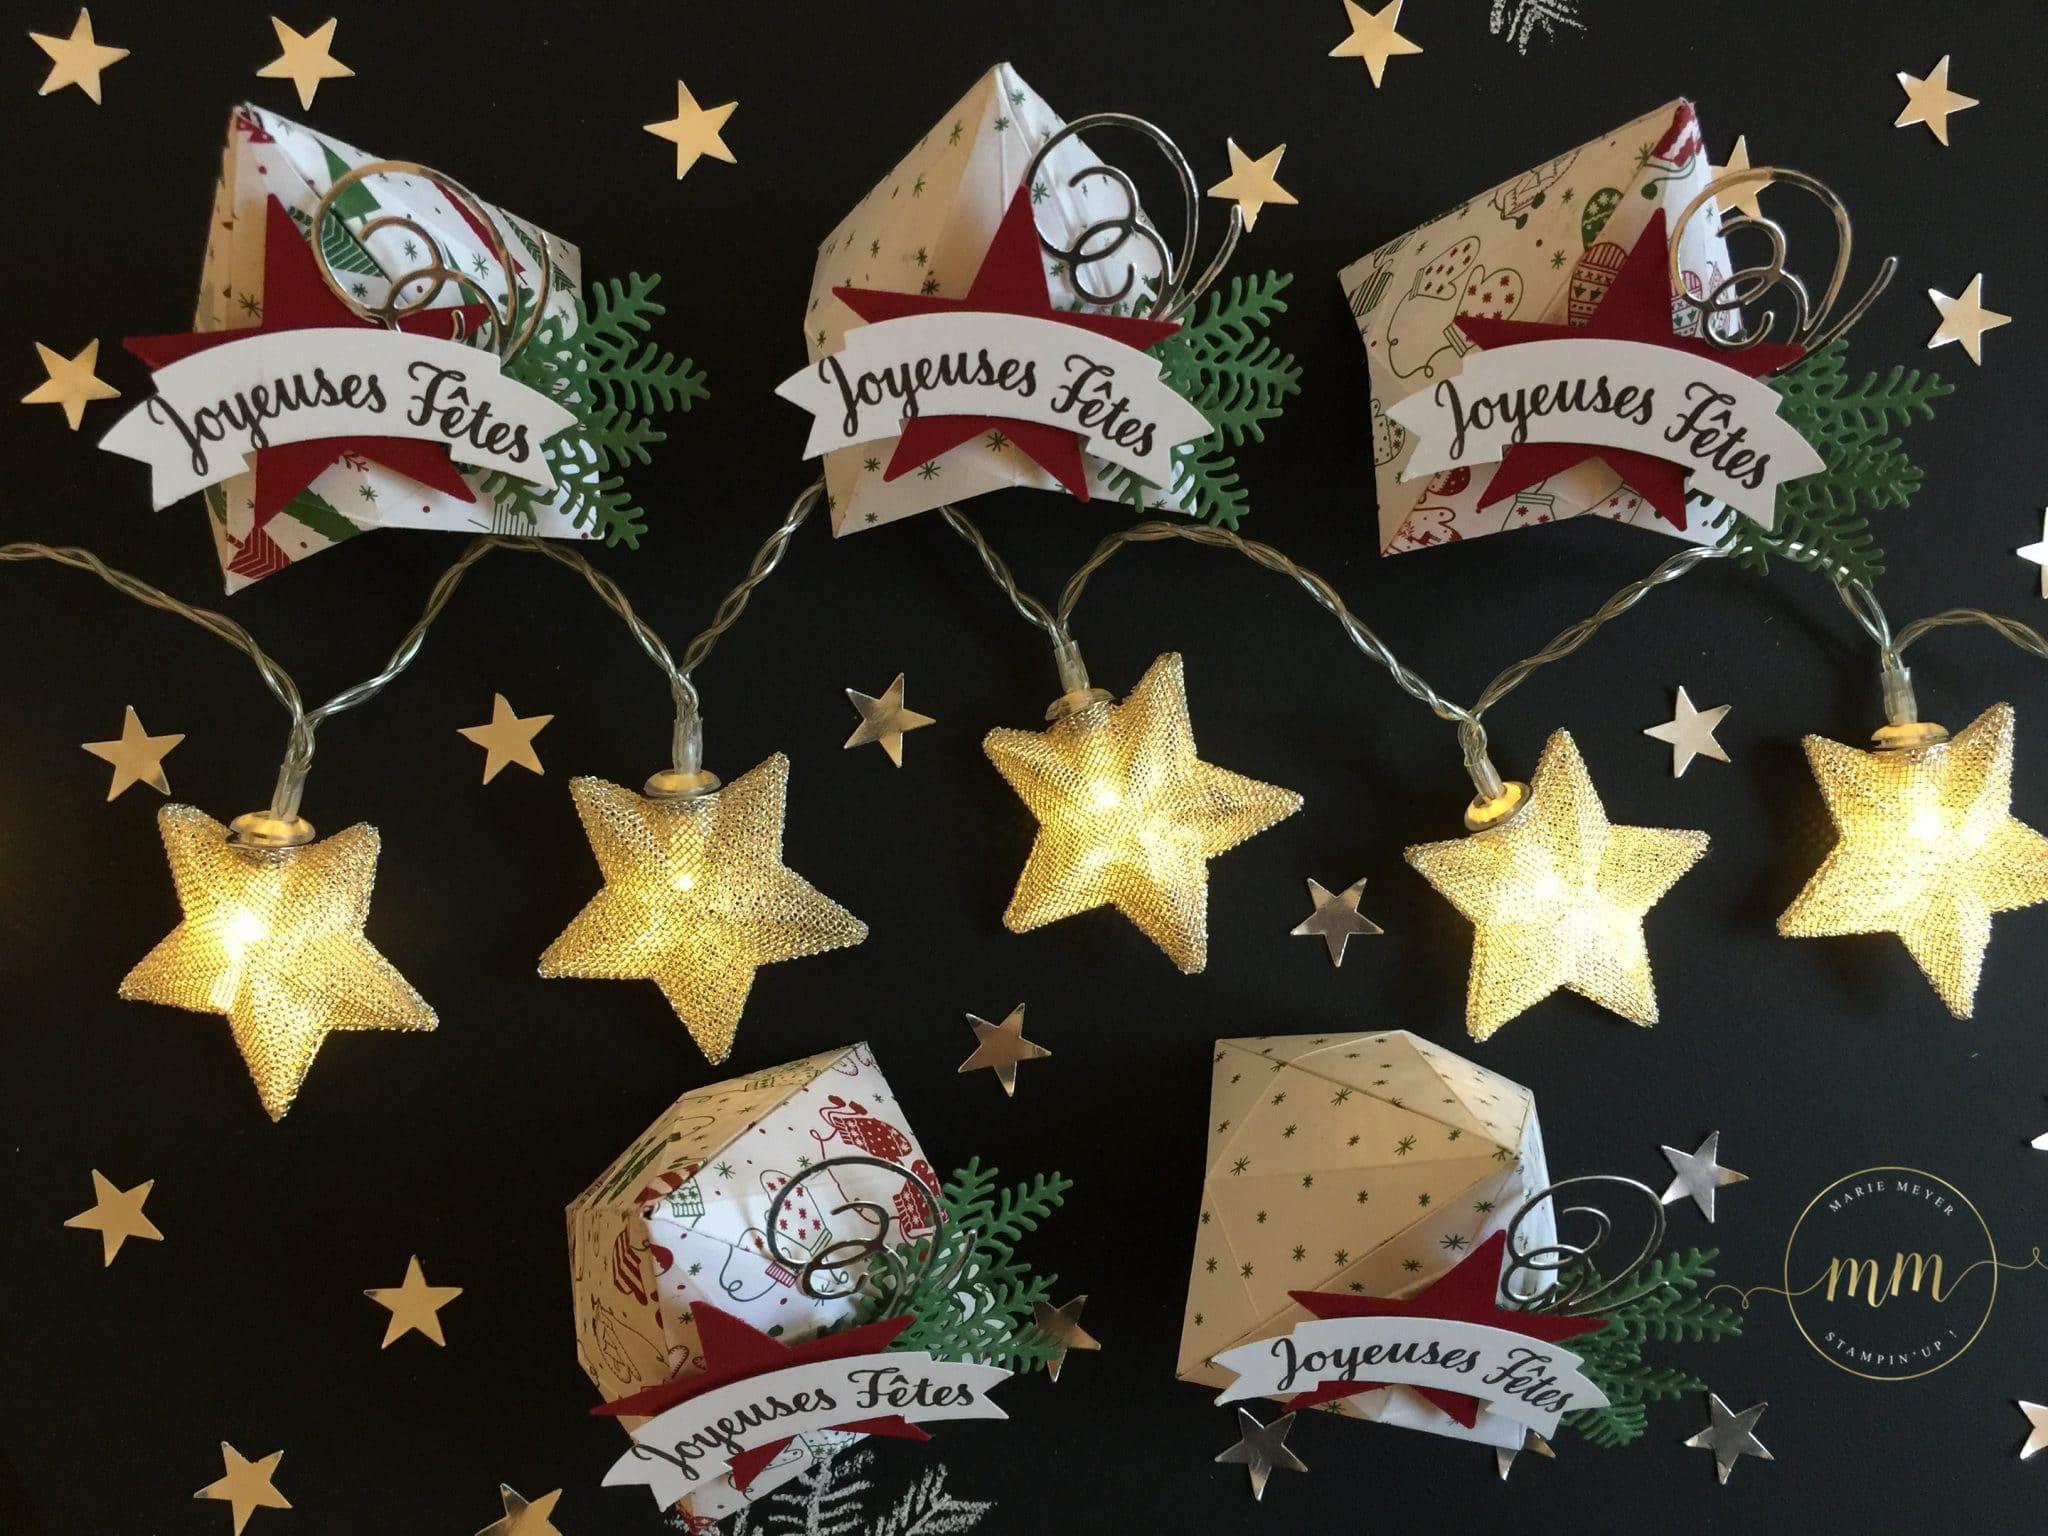 Boîtes origami de Noël Papier Soyons Joyeux et tutoriel, Perforatrice Deux banderoles, tampons Etoile lumineuse, Thinlits Escaliers de Noël & Flocons virevoltants par Marie Meyer Stampin up - http://ateliers-scrapbooking.fr/ - Origami Christmas tutorial, Be Merry paper, Duet banner punch, Star of light stamp, Swirly Snowflakes & Christmas Staircase Thinlits - Anteilung Origami, Papier Voller Vorfreude, Bannerduo Stenzen, Weihnachtssternstempel, Thinlits Flockenreigen & Weihnachtliche Treppe